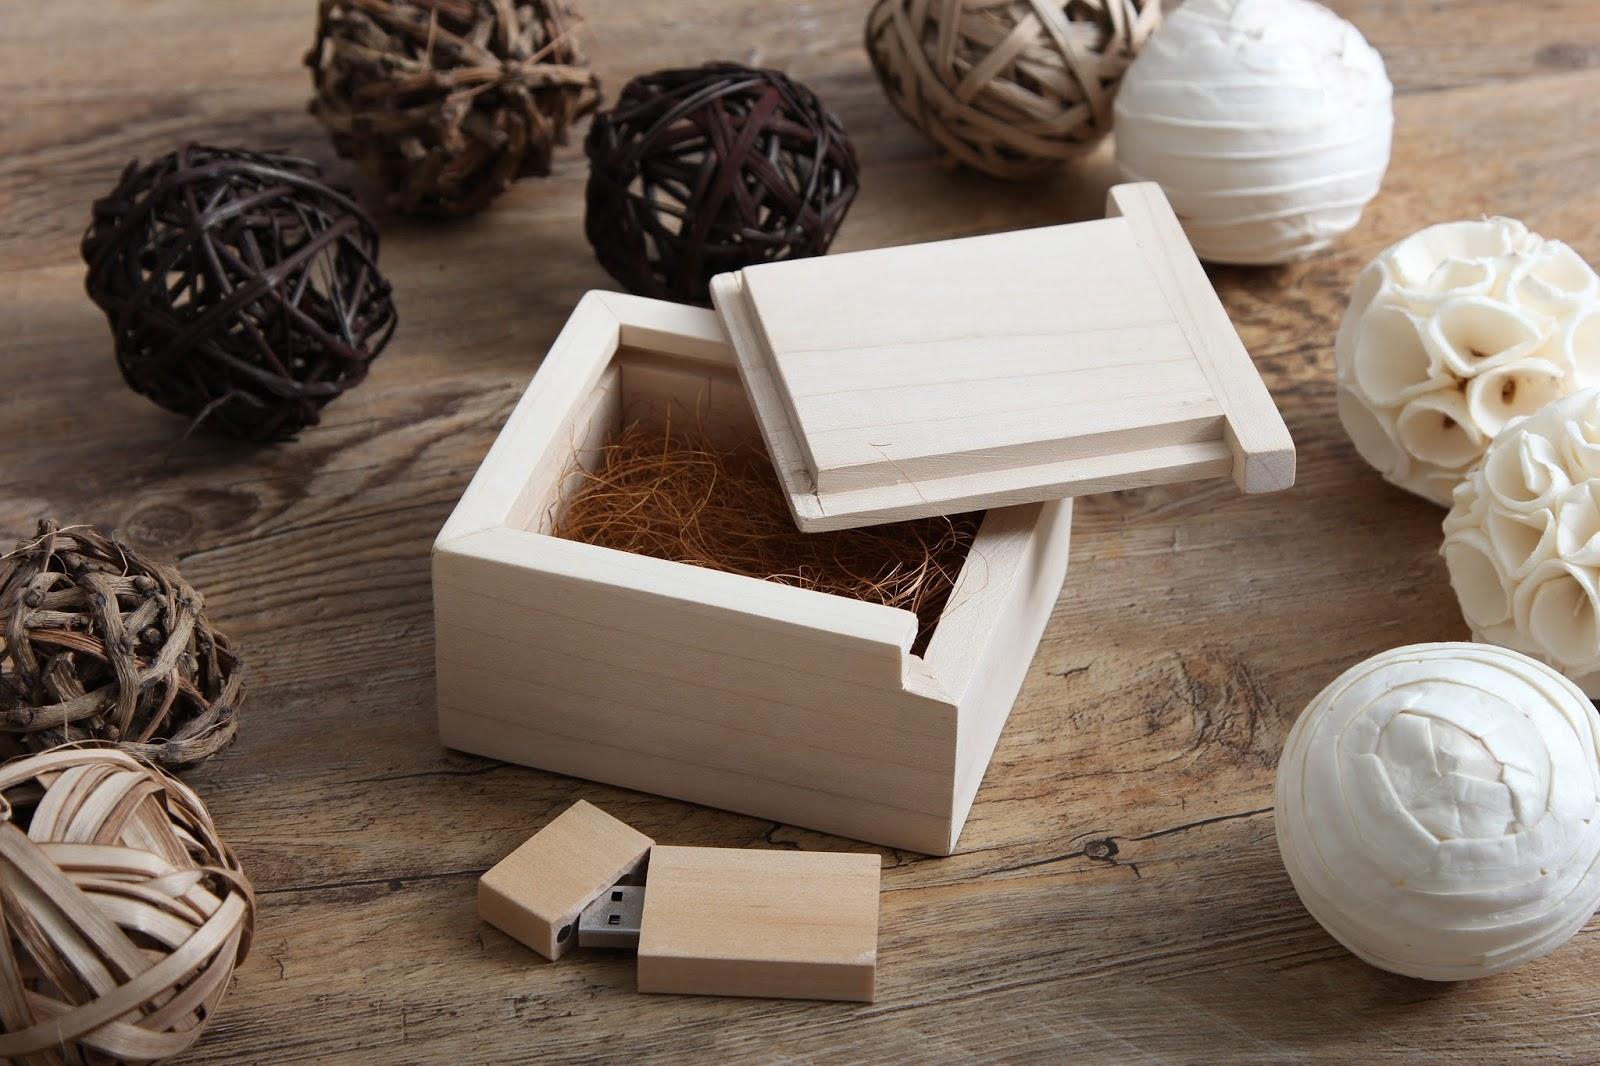 Cajas para fotografos cajas para pendrive usb - Cajas para fotografos ...